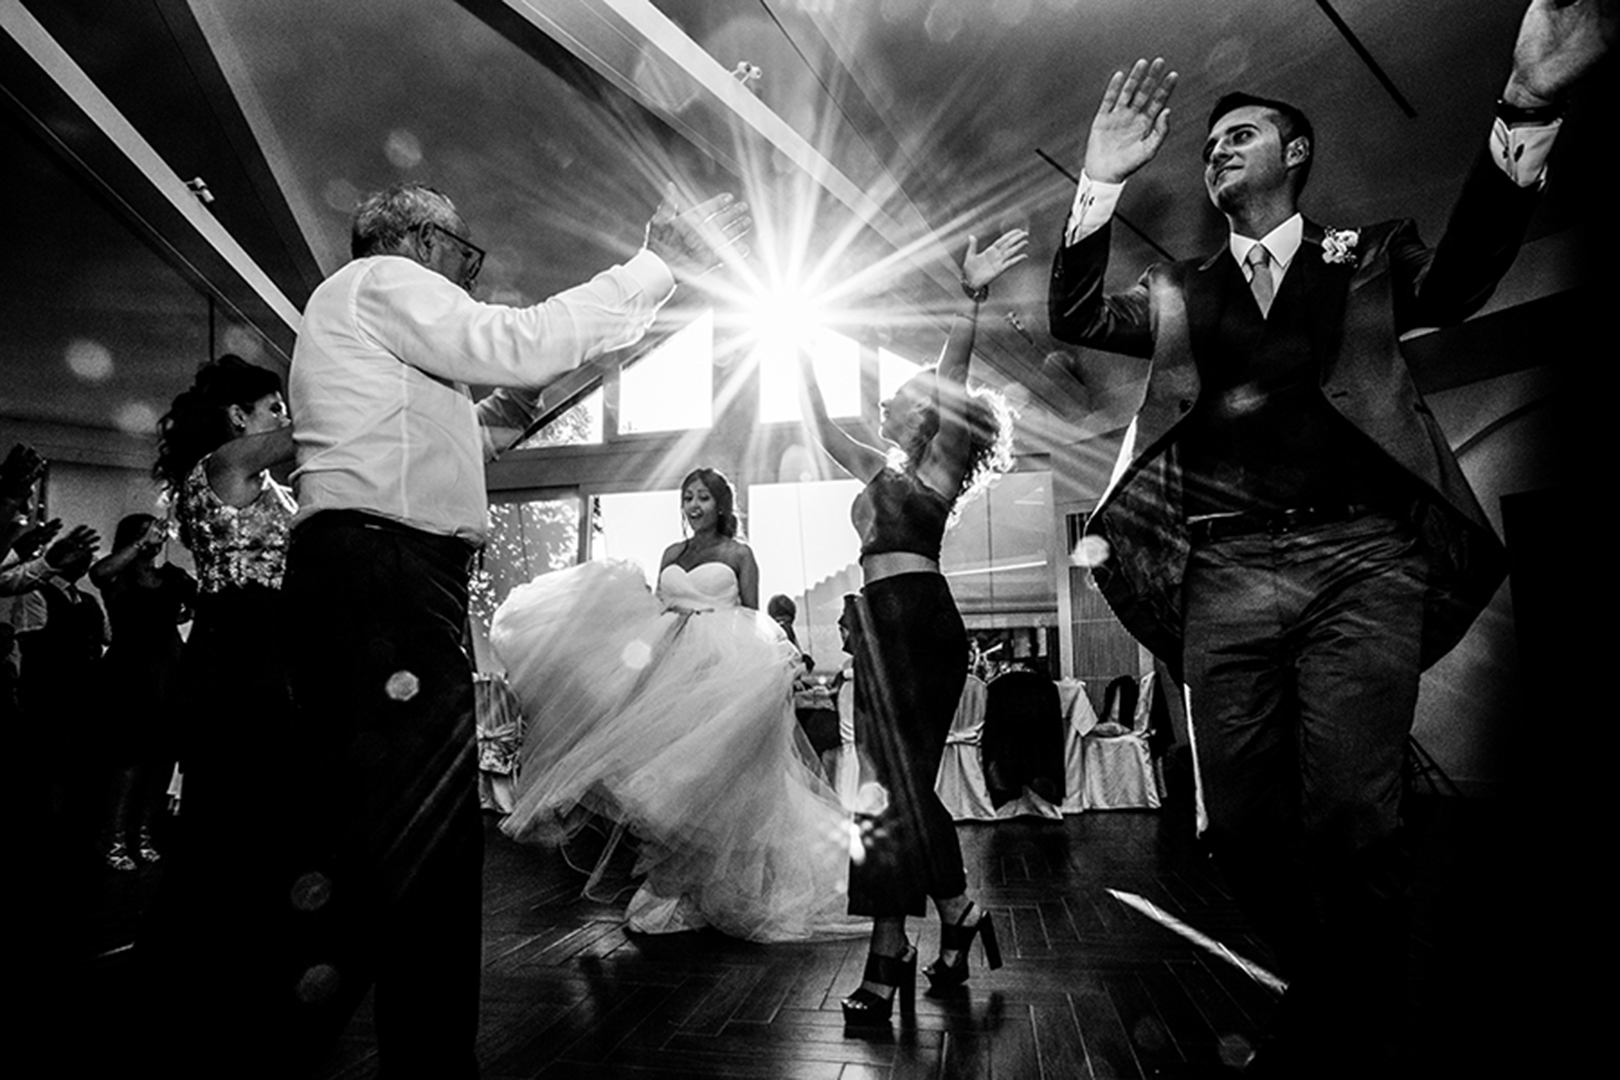 gianni-lepore-festa-amici-balli-matrimonio